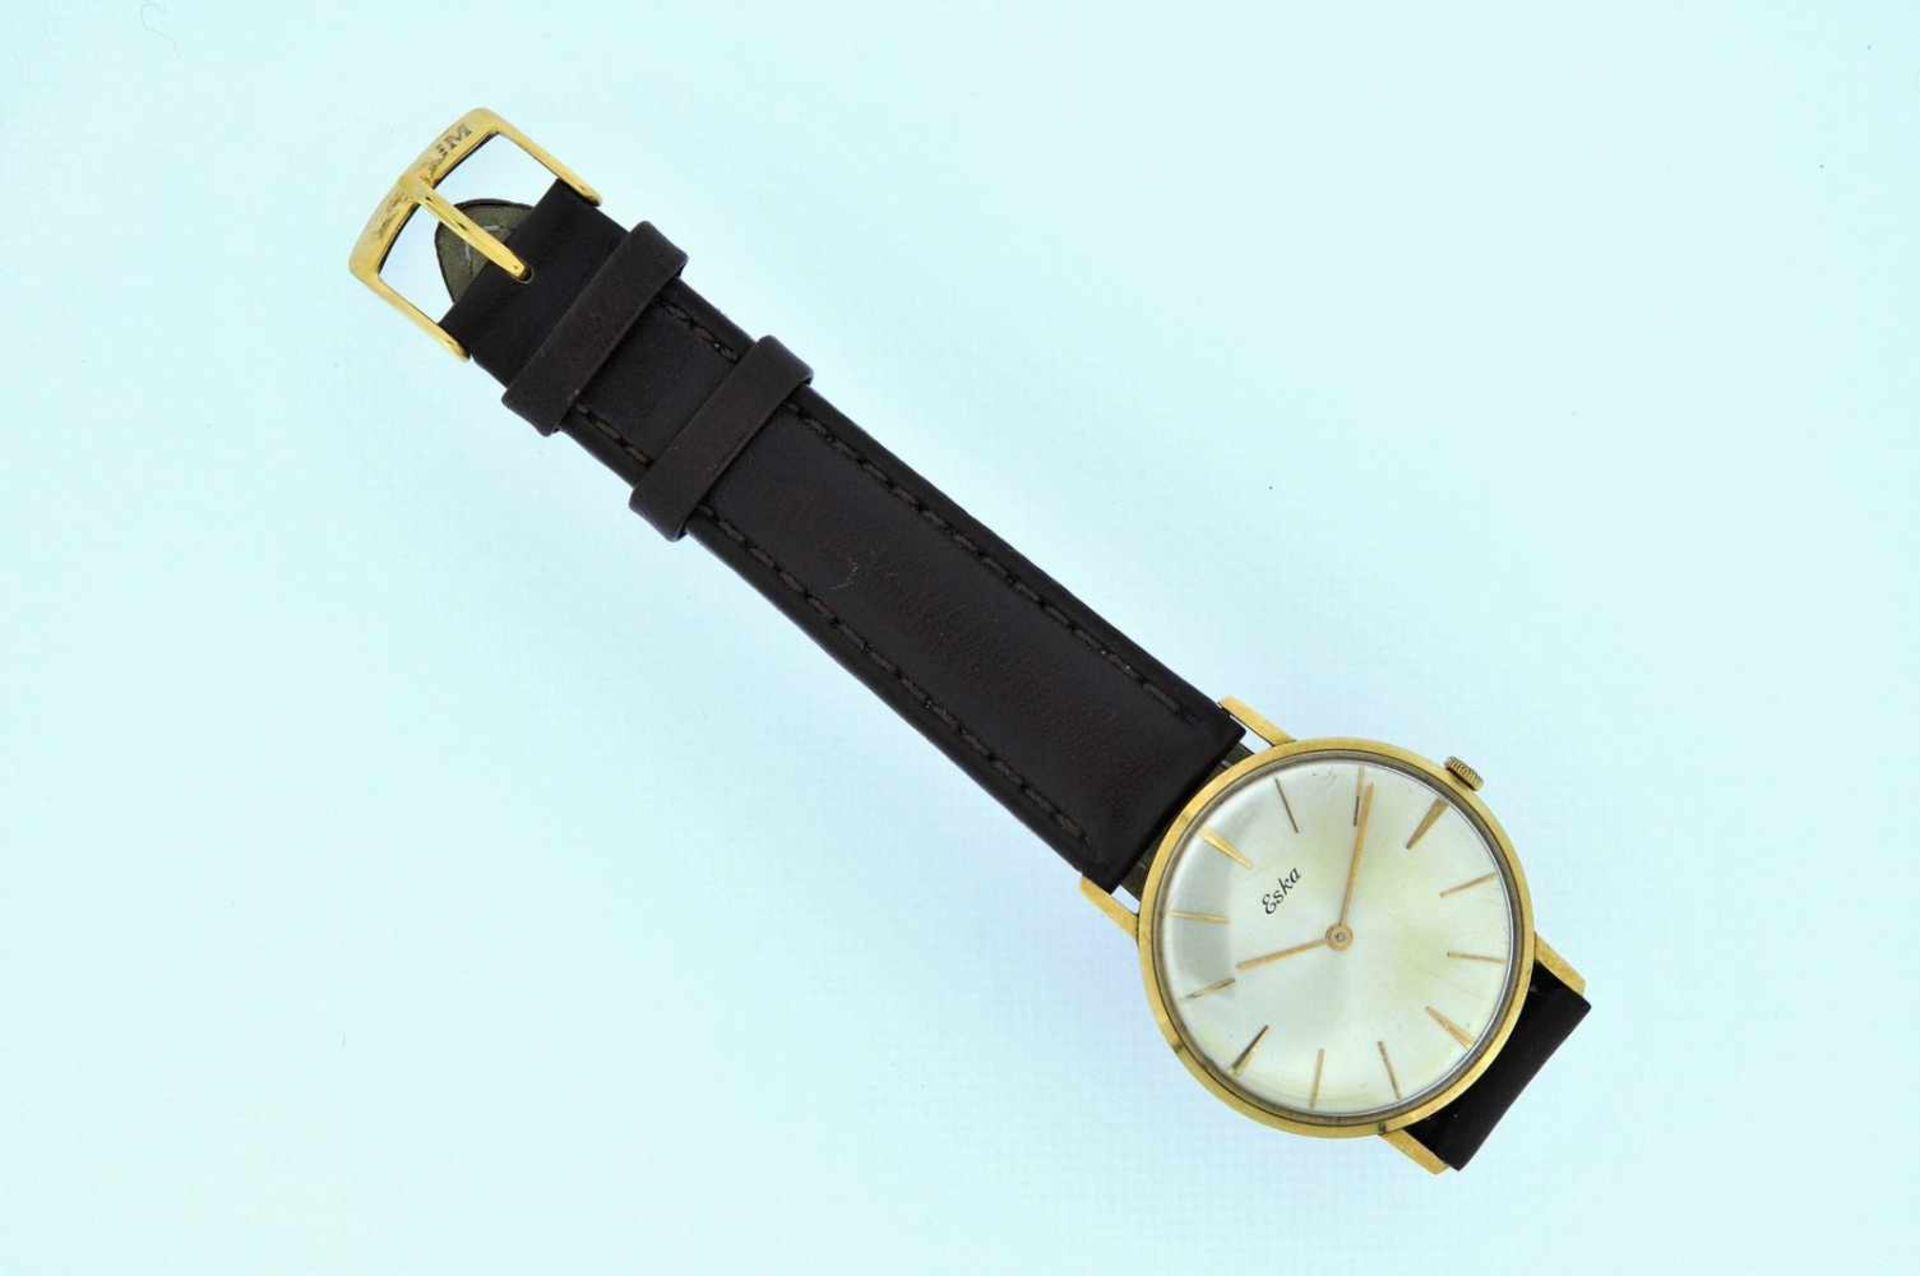 Eska Goldene Armbanduhr an Lederband, Eska, Handaufzug, Ankerwerk, Werkservice empfohlen, 28,1 g. - Bild 6 aus 6